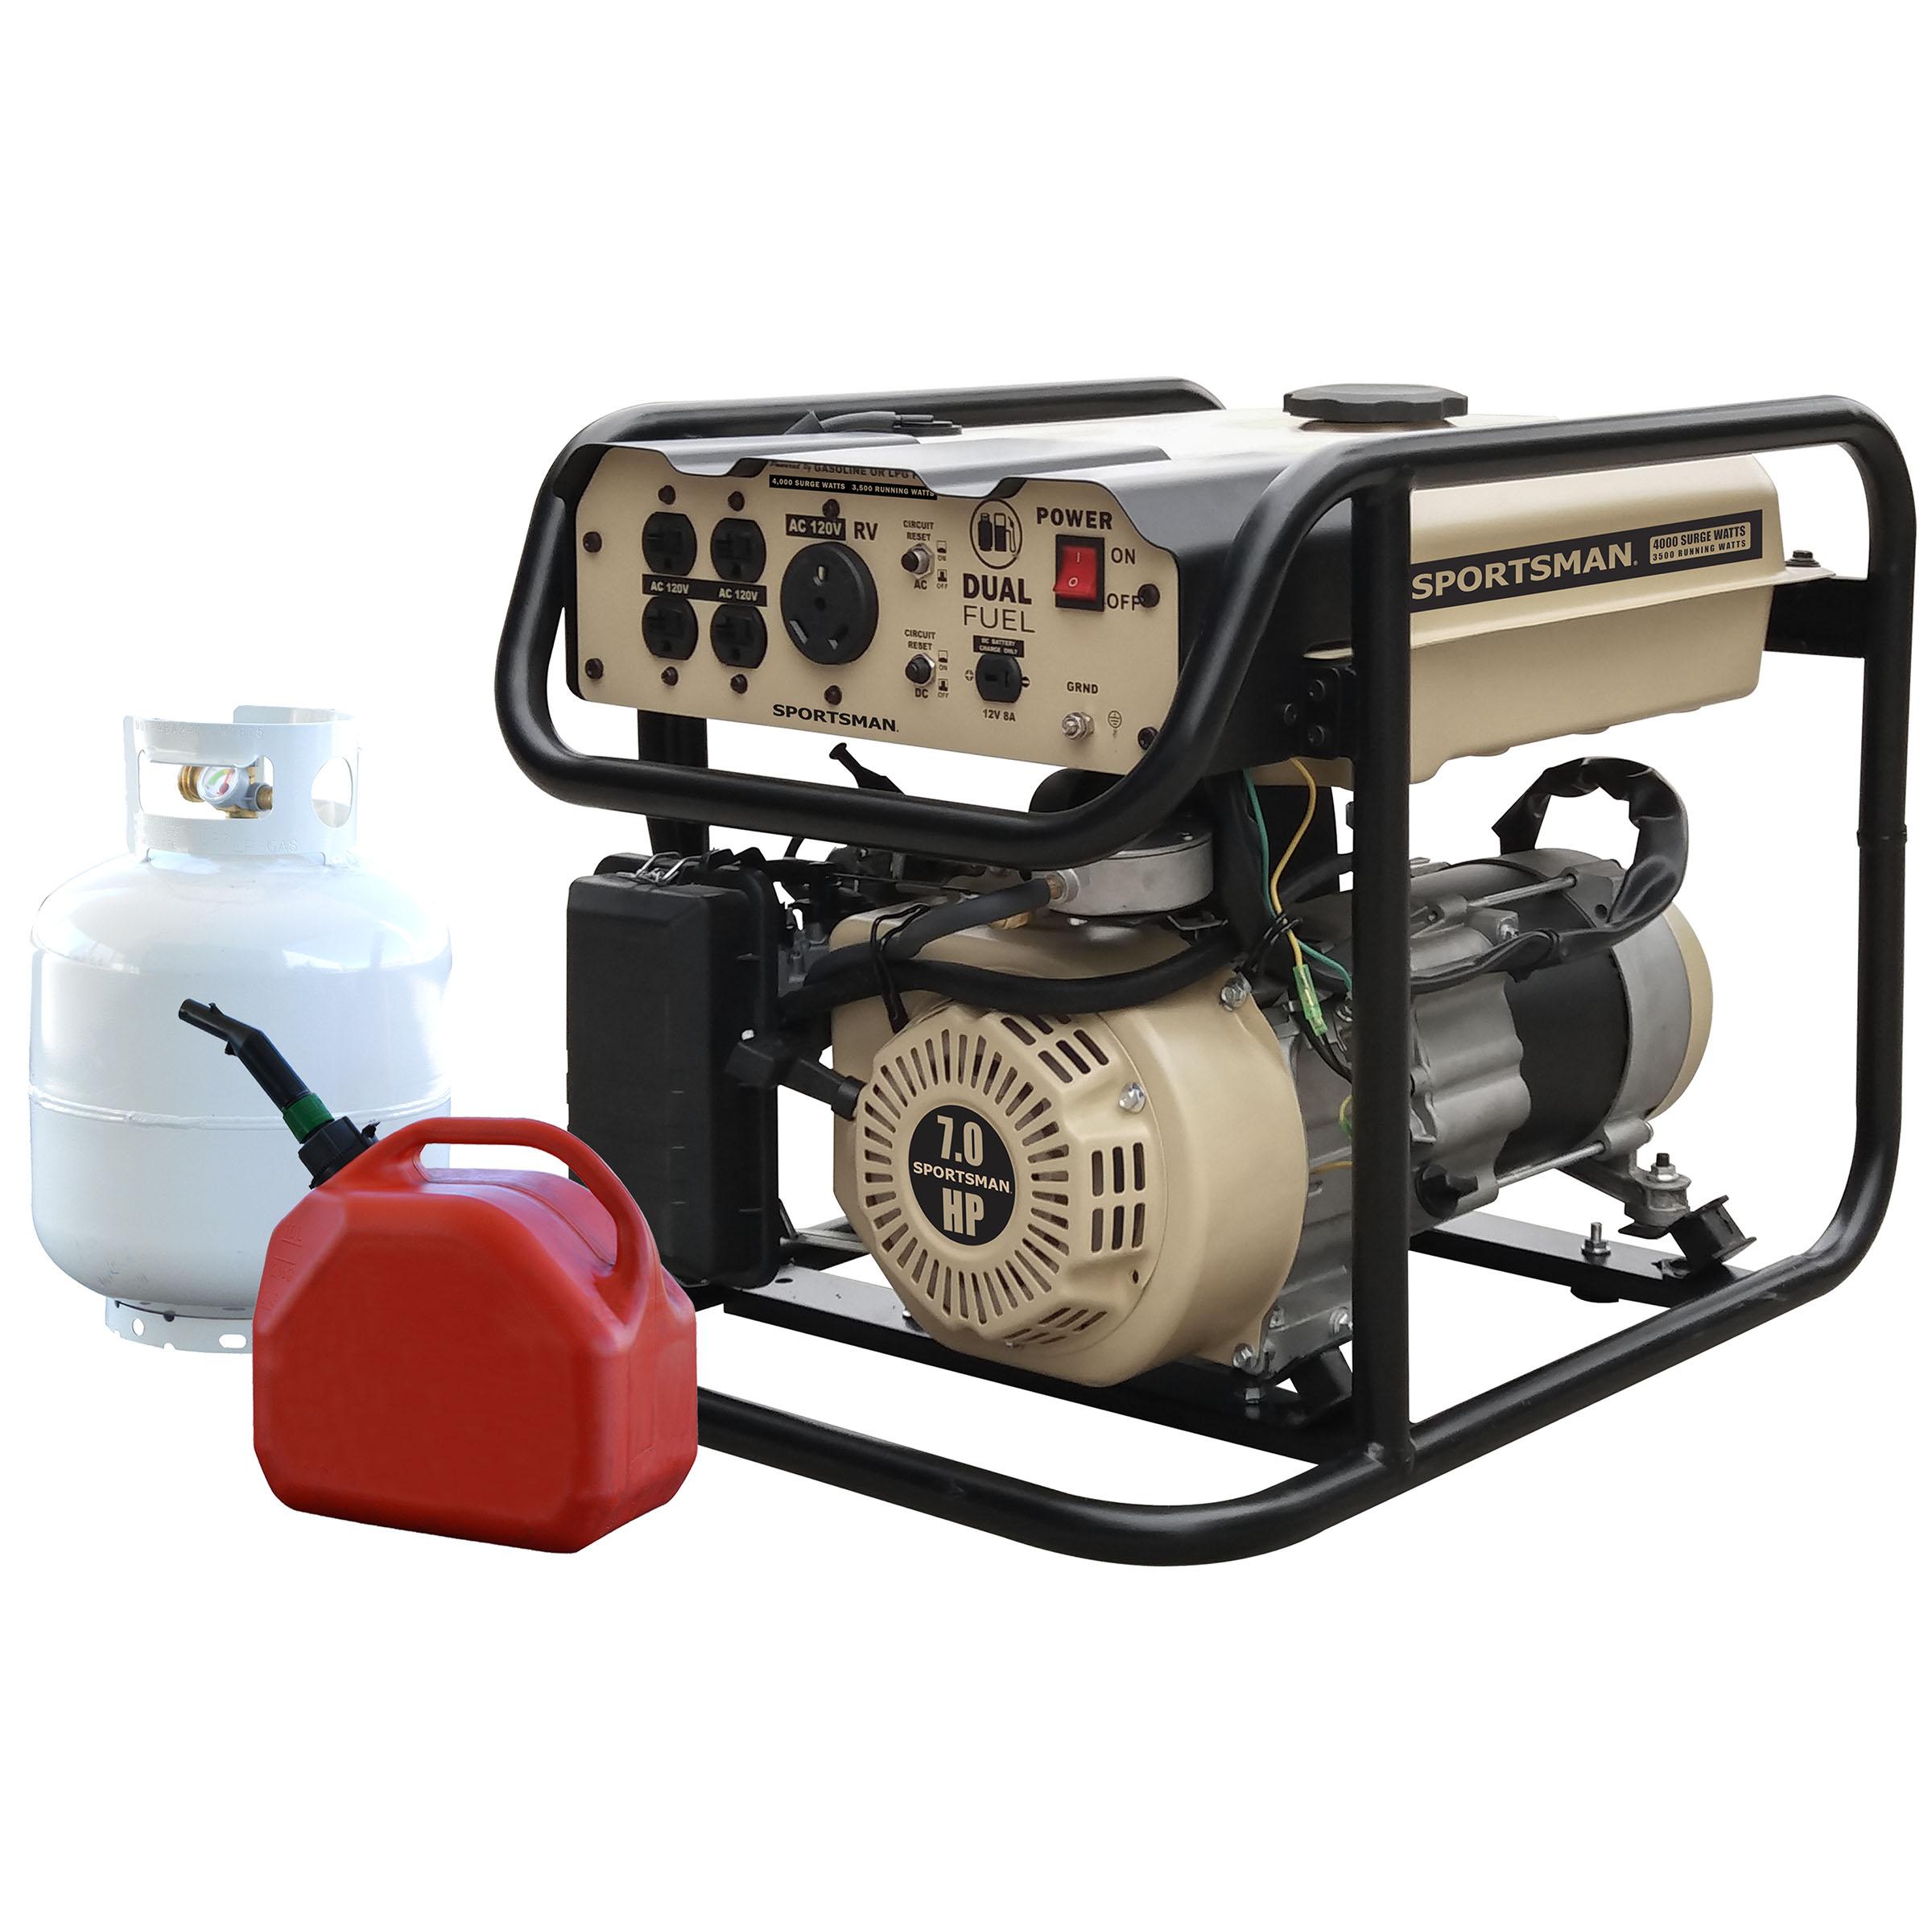 Sportsman 4,000/3,500W Dual Fuel Powered Portable Generator